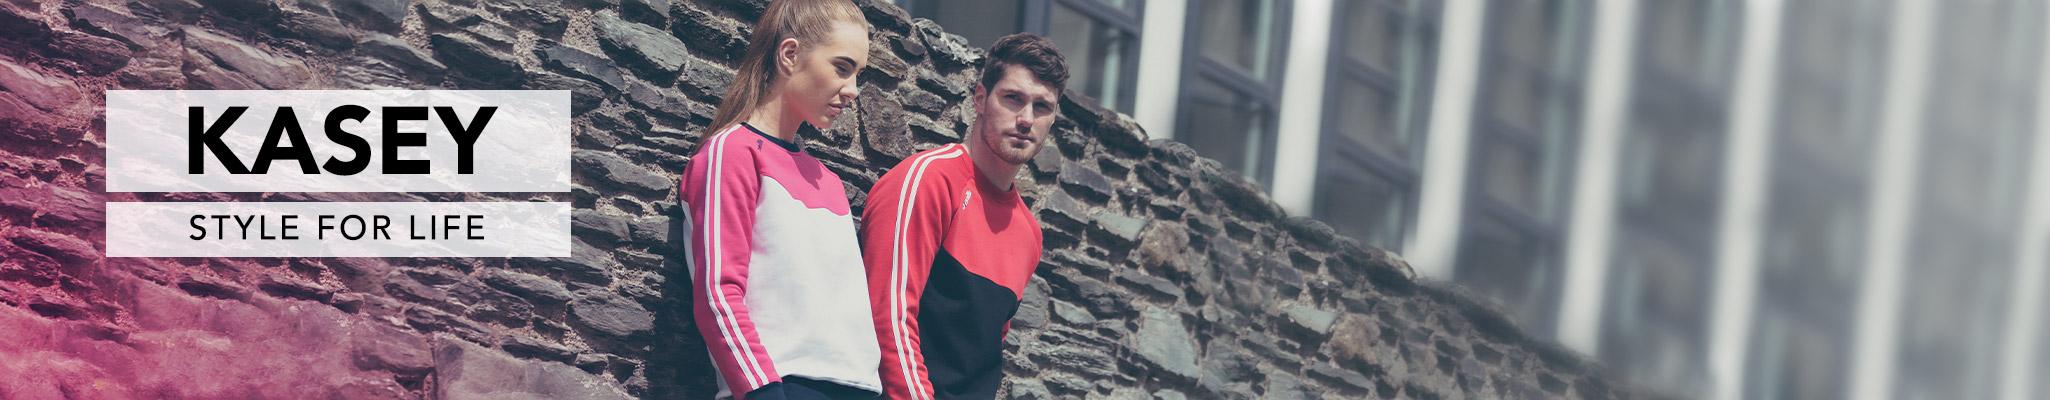 iCreate Design Your Own Kit | O'Neills International Sportswear